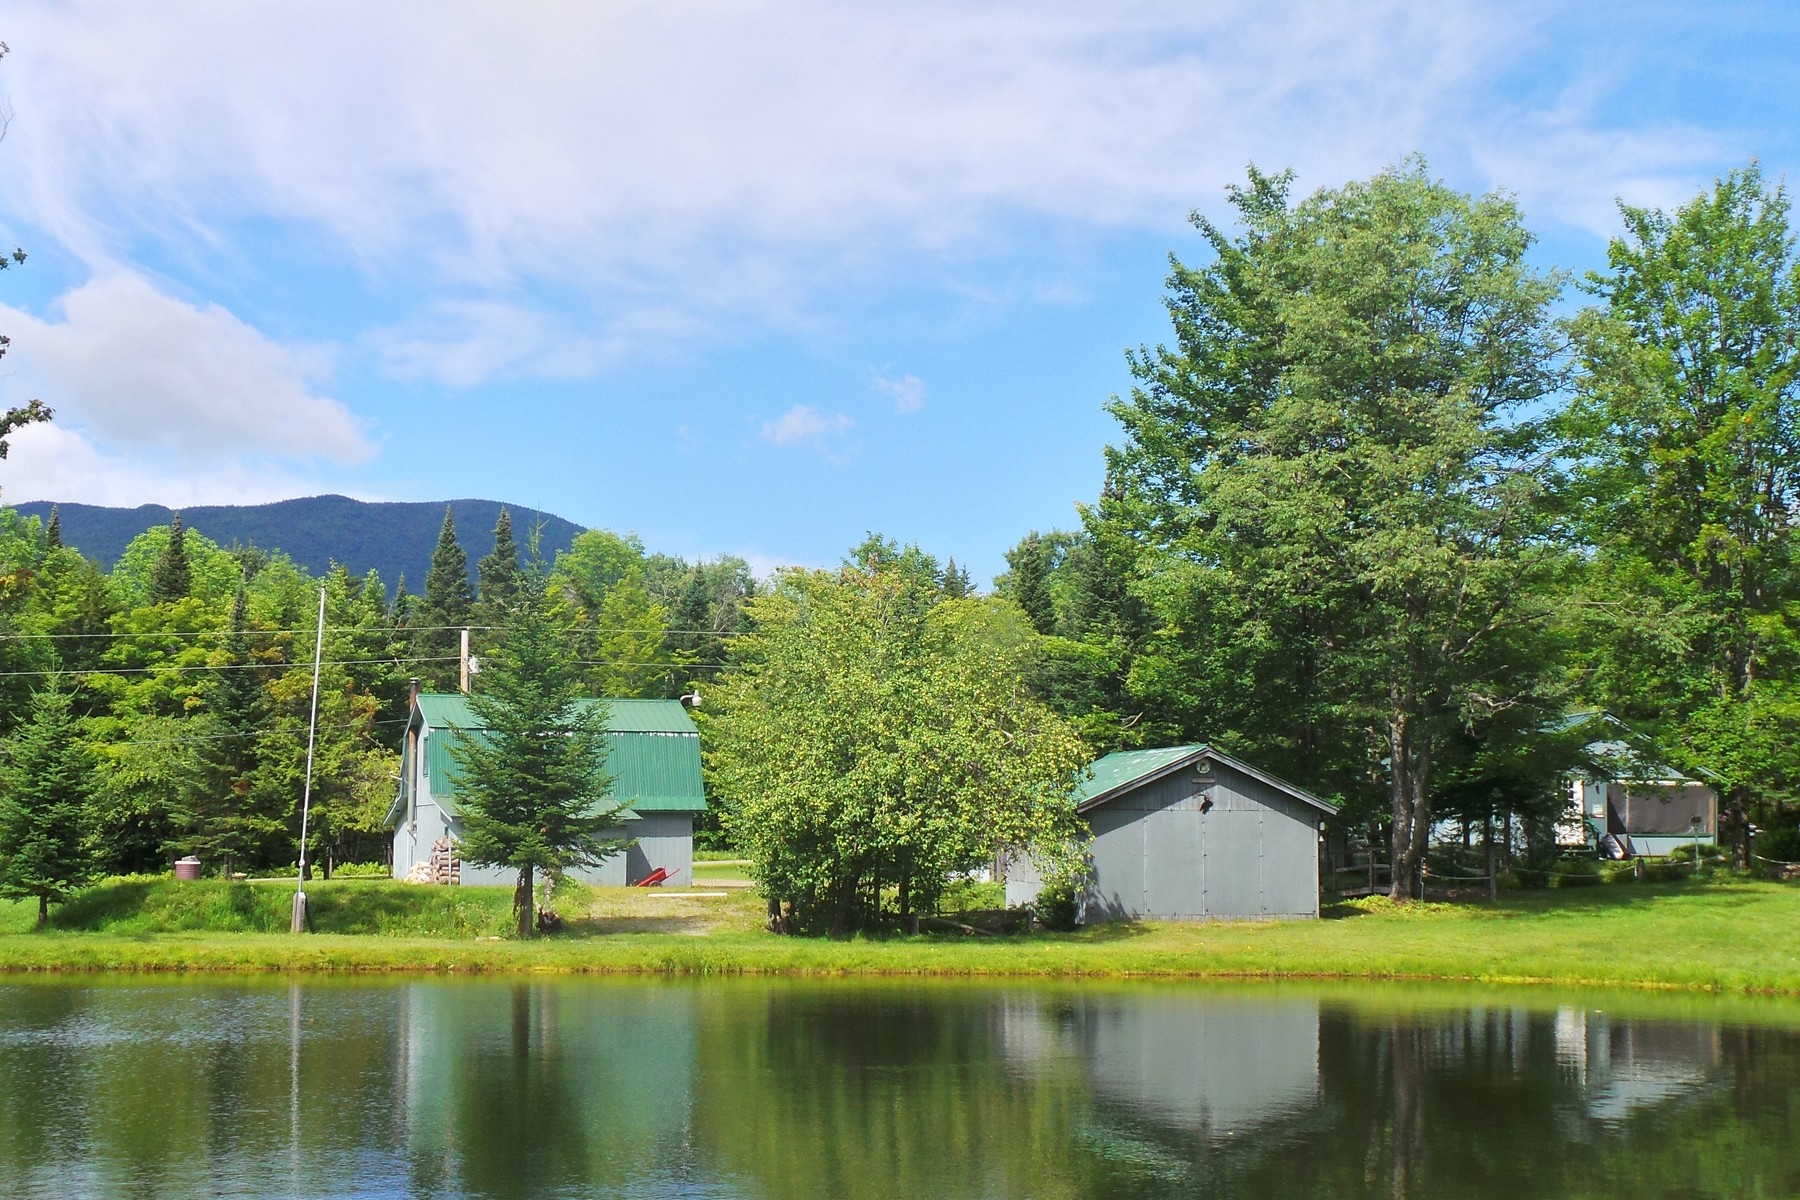 Moradia para Venda às Balance Rock Home 3551 Balance Rock Rd Westfield, Vermont, 05874 Estados Unidos